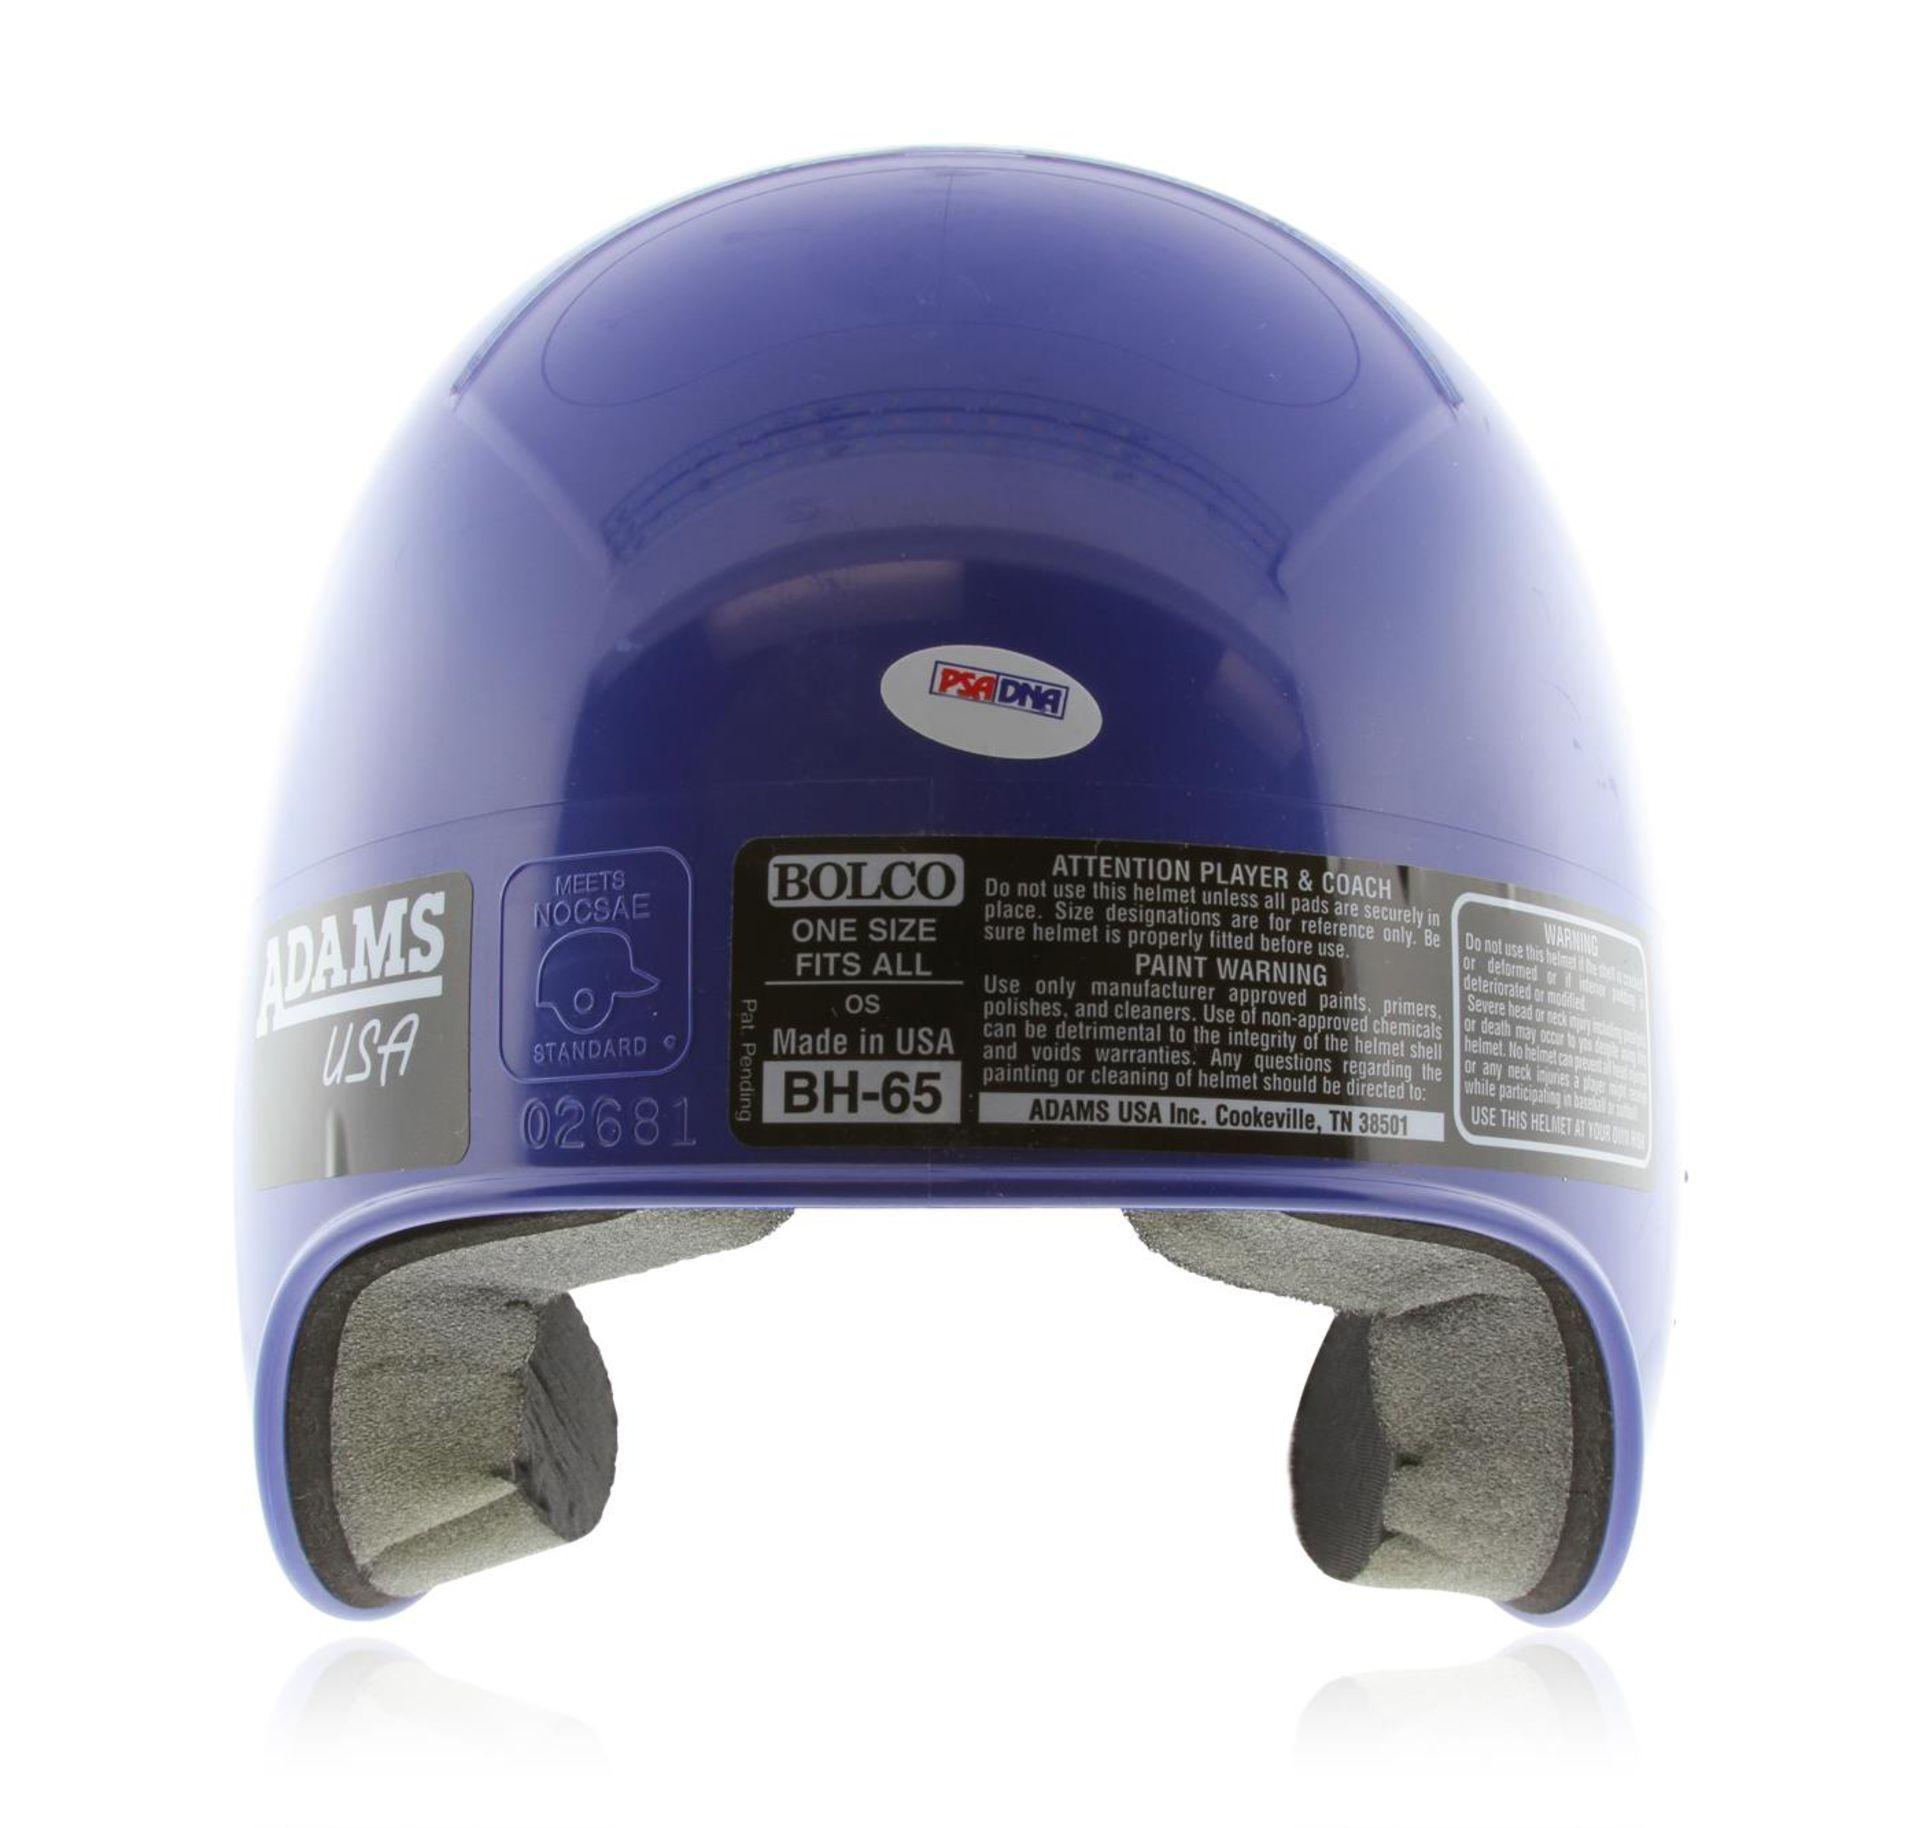 Autographed Duke Snider LA Dodgers Helmet PSA Certified - Image 3 of 4